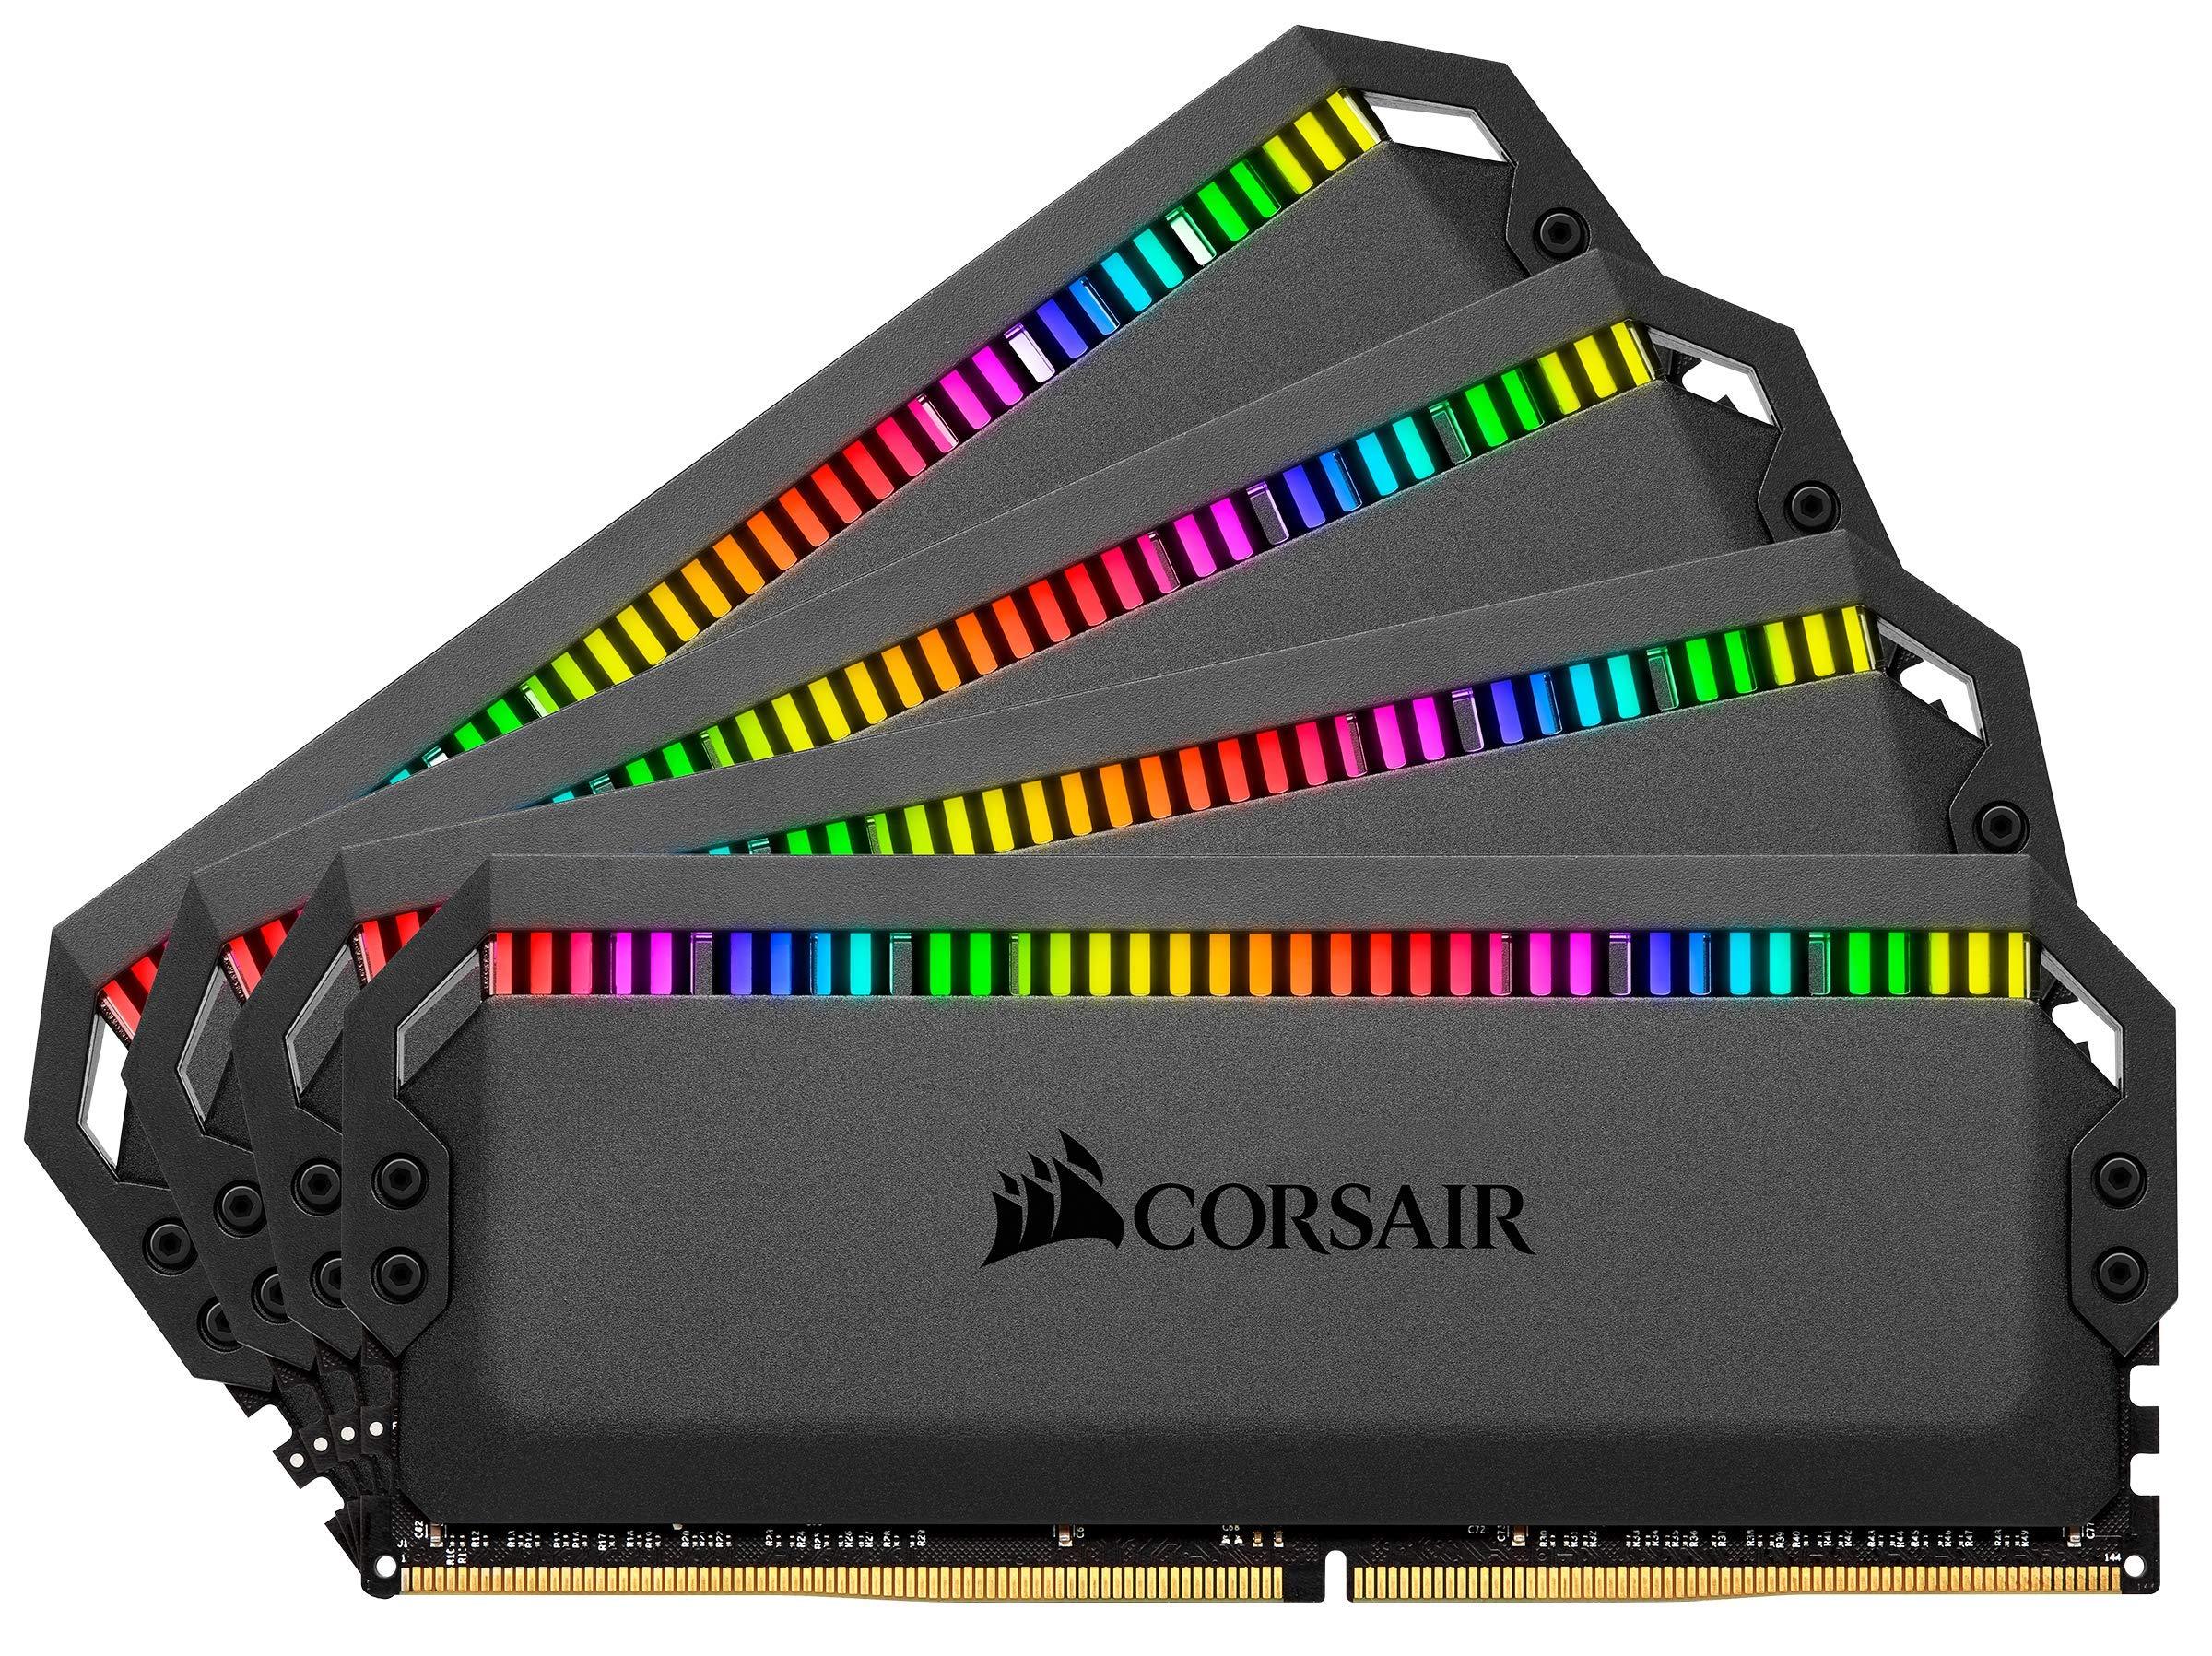 Corsair CORSAIR Dominator Platinum RGB 64GB (4x16GB) DDR4 3600 (PC4-28800) C18 1.35V AMD Optimized Memory - Black…